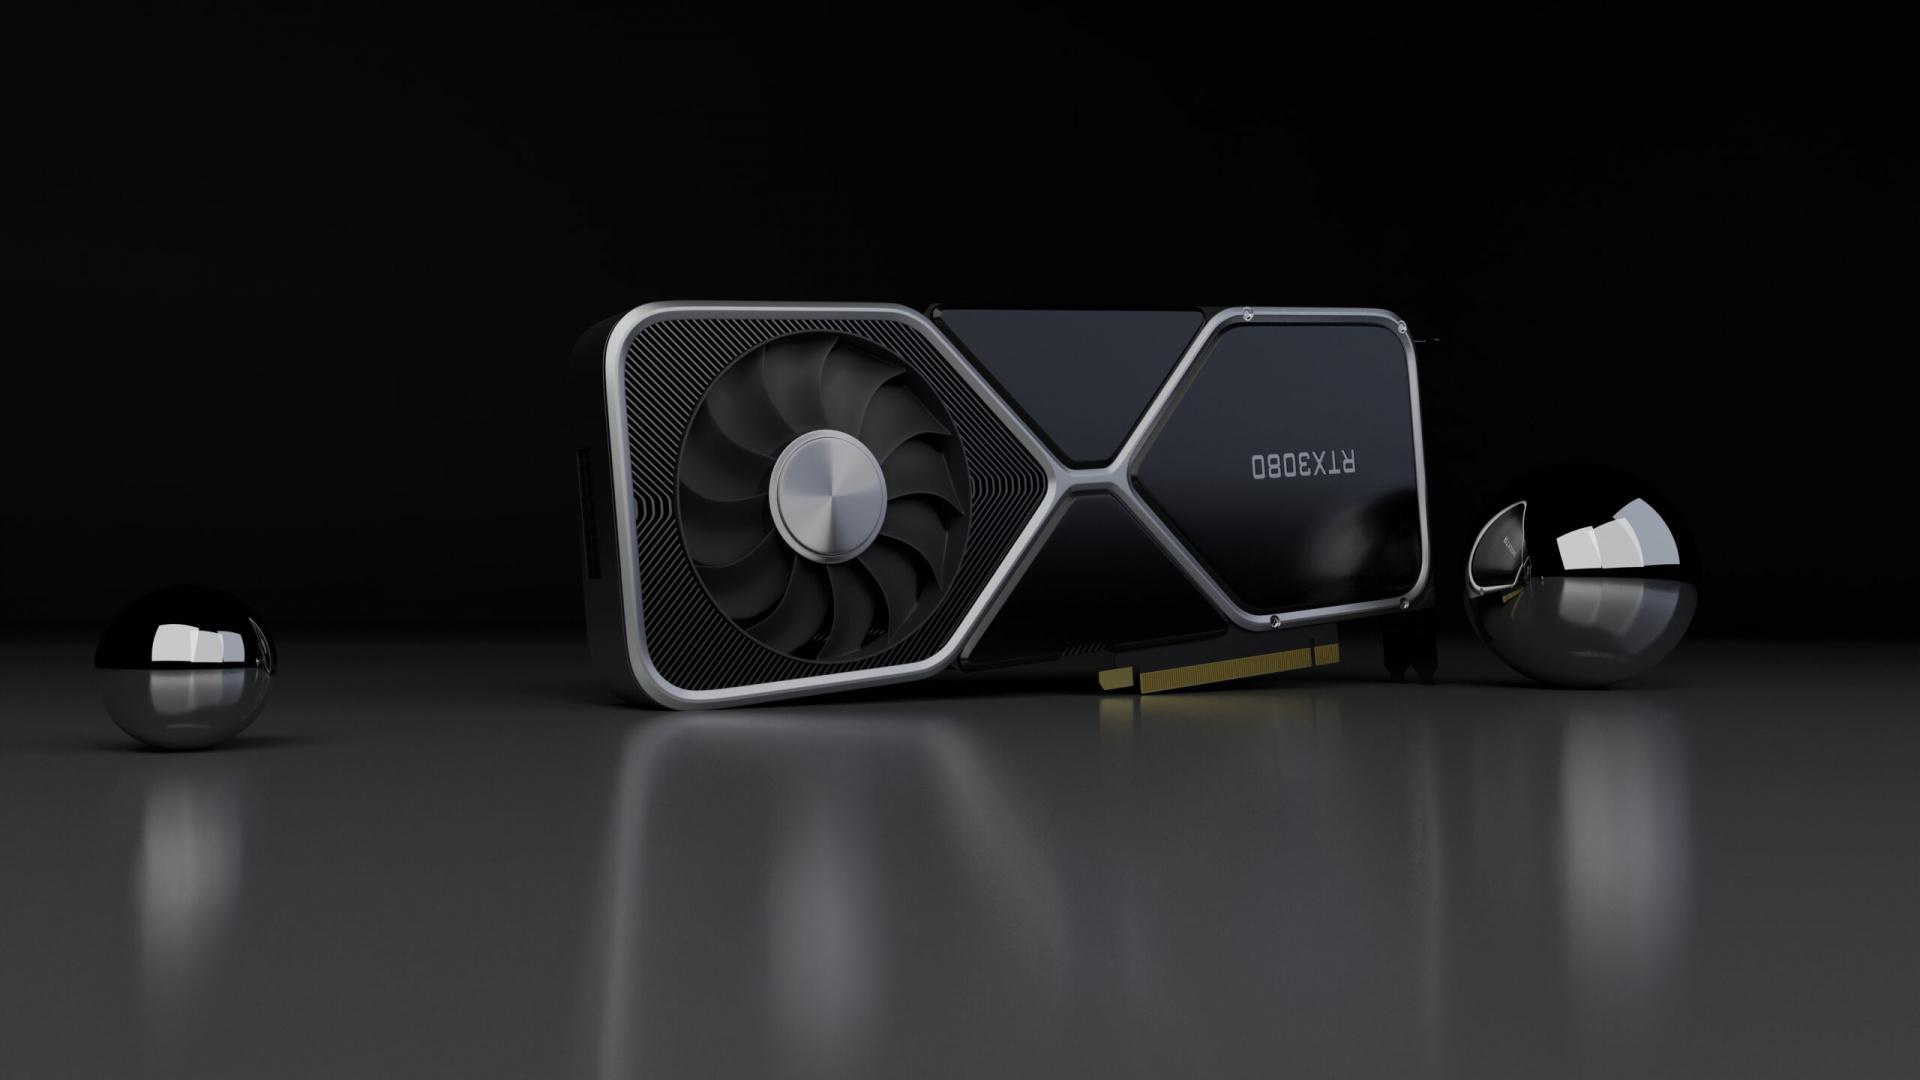 Цена видеокарт GeForce RTX 30хх не уляжется до апреля, считает NVIDIA